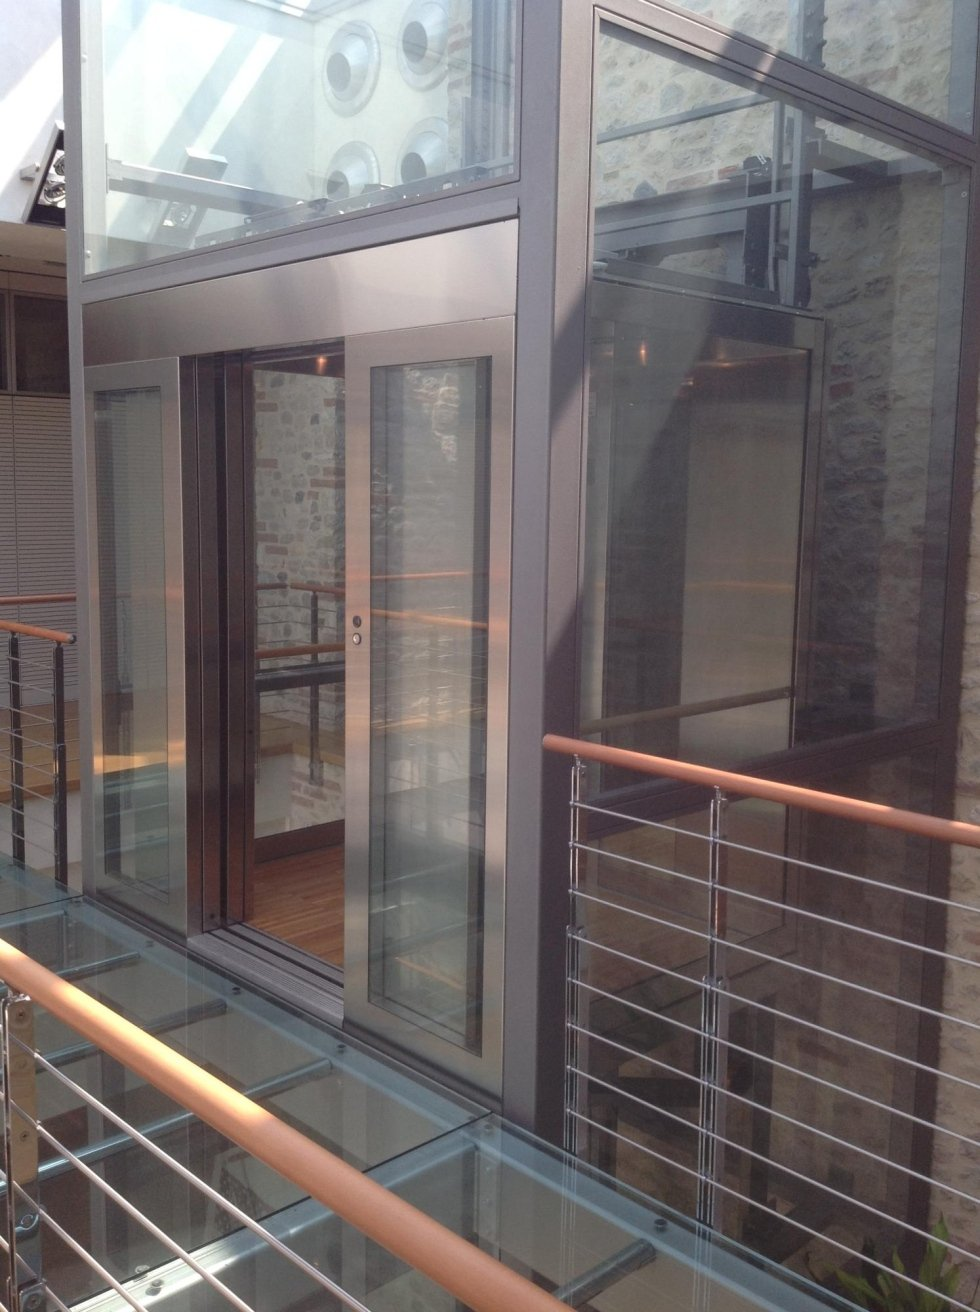 grande ascensore panoramico in vetro